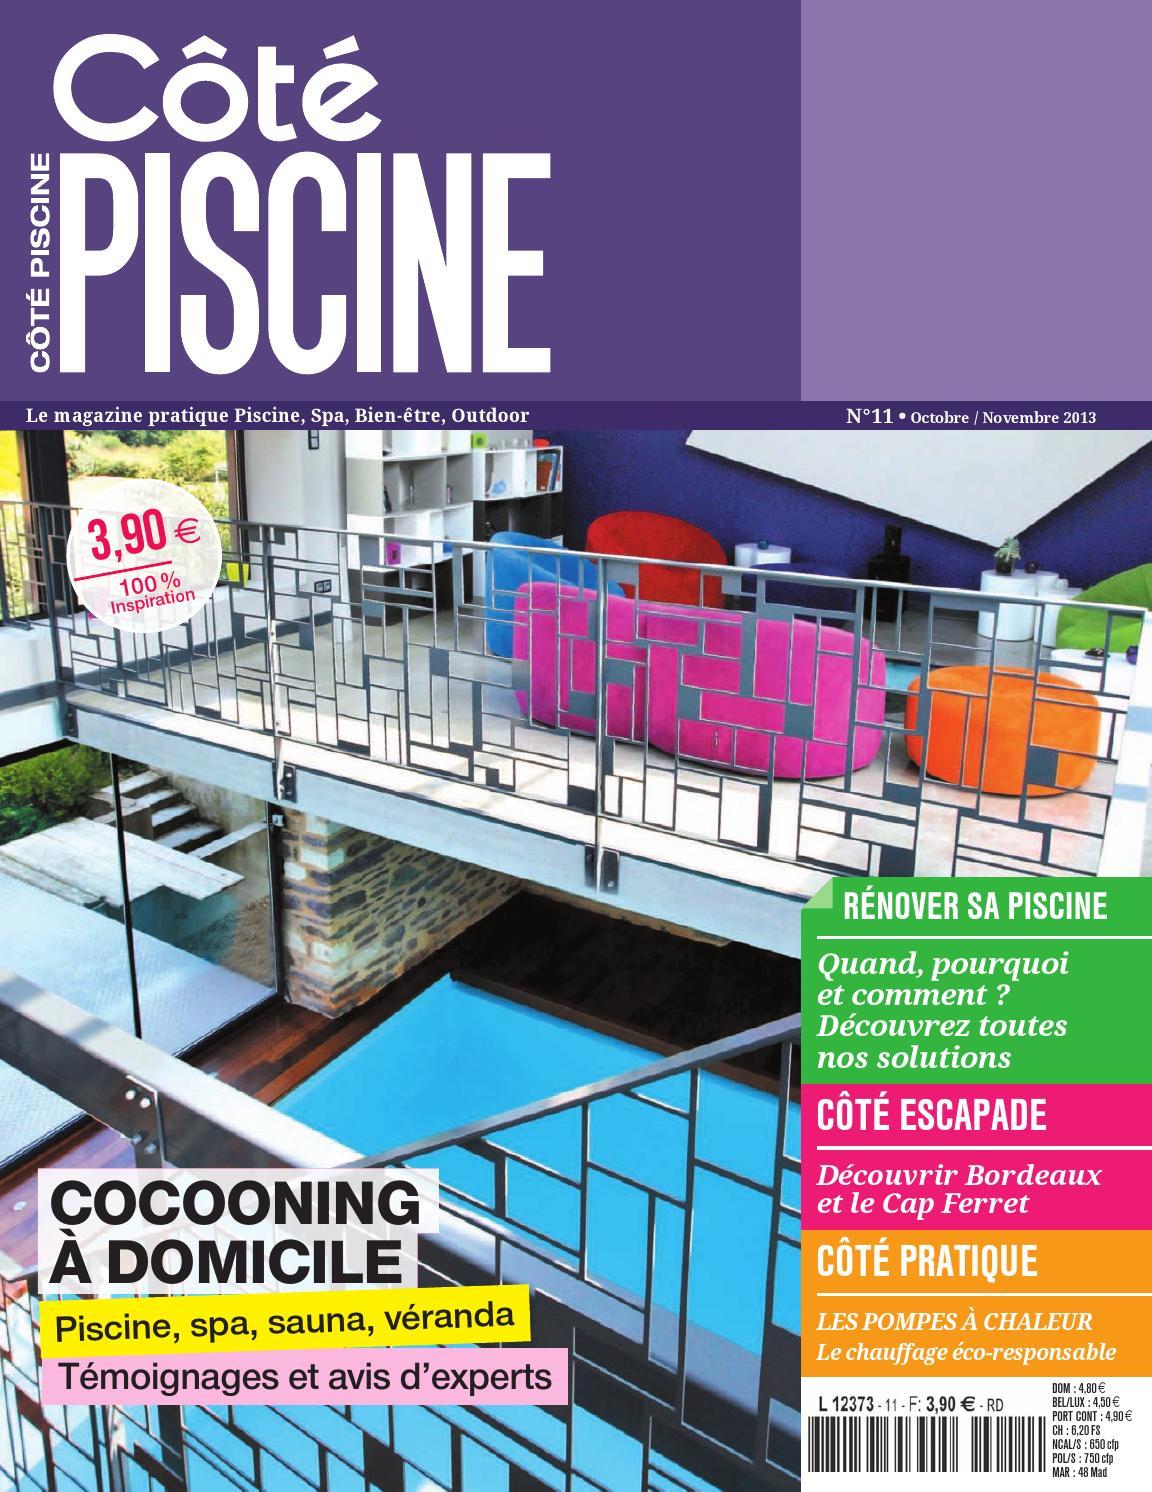 Magazine Côté Piscine N°11 By Poulin Athy - Issuu destiné Piscine Brignais